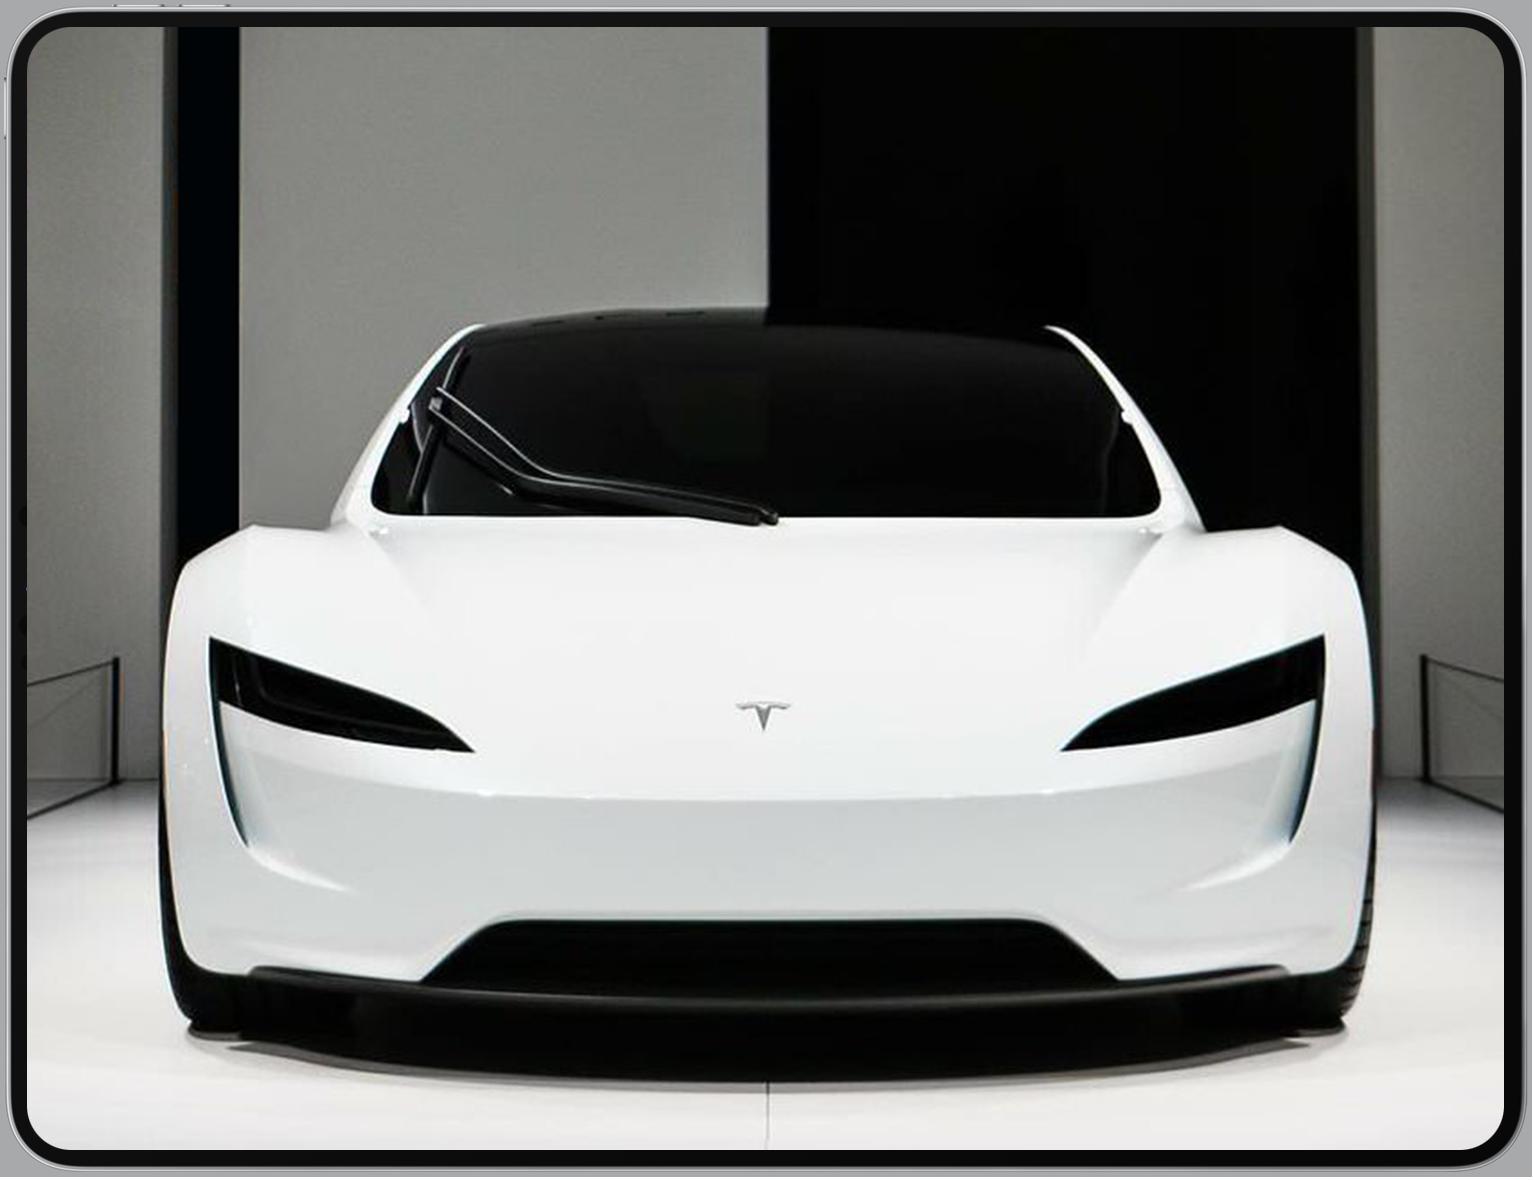 iPad X Roadster.png